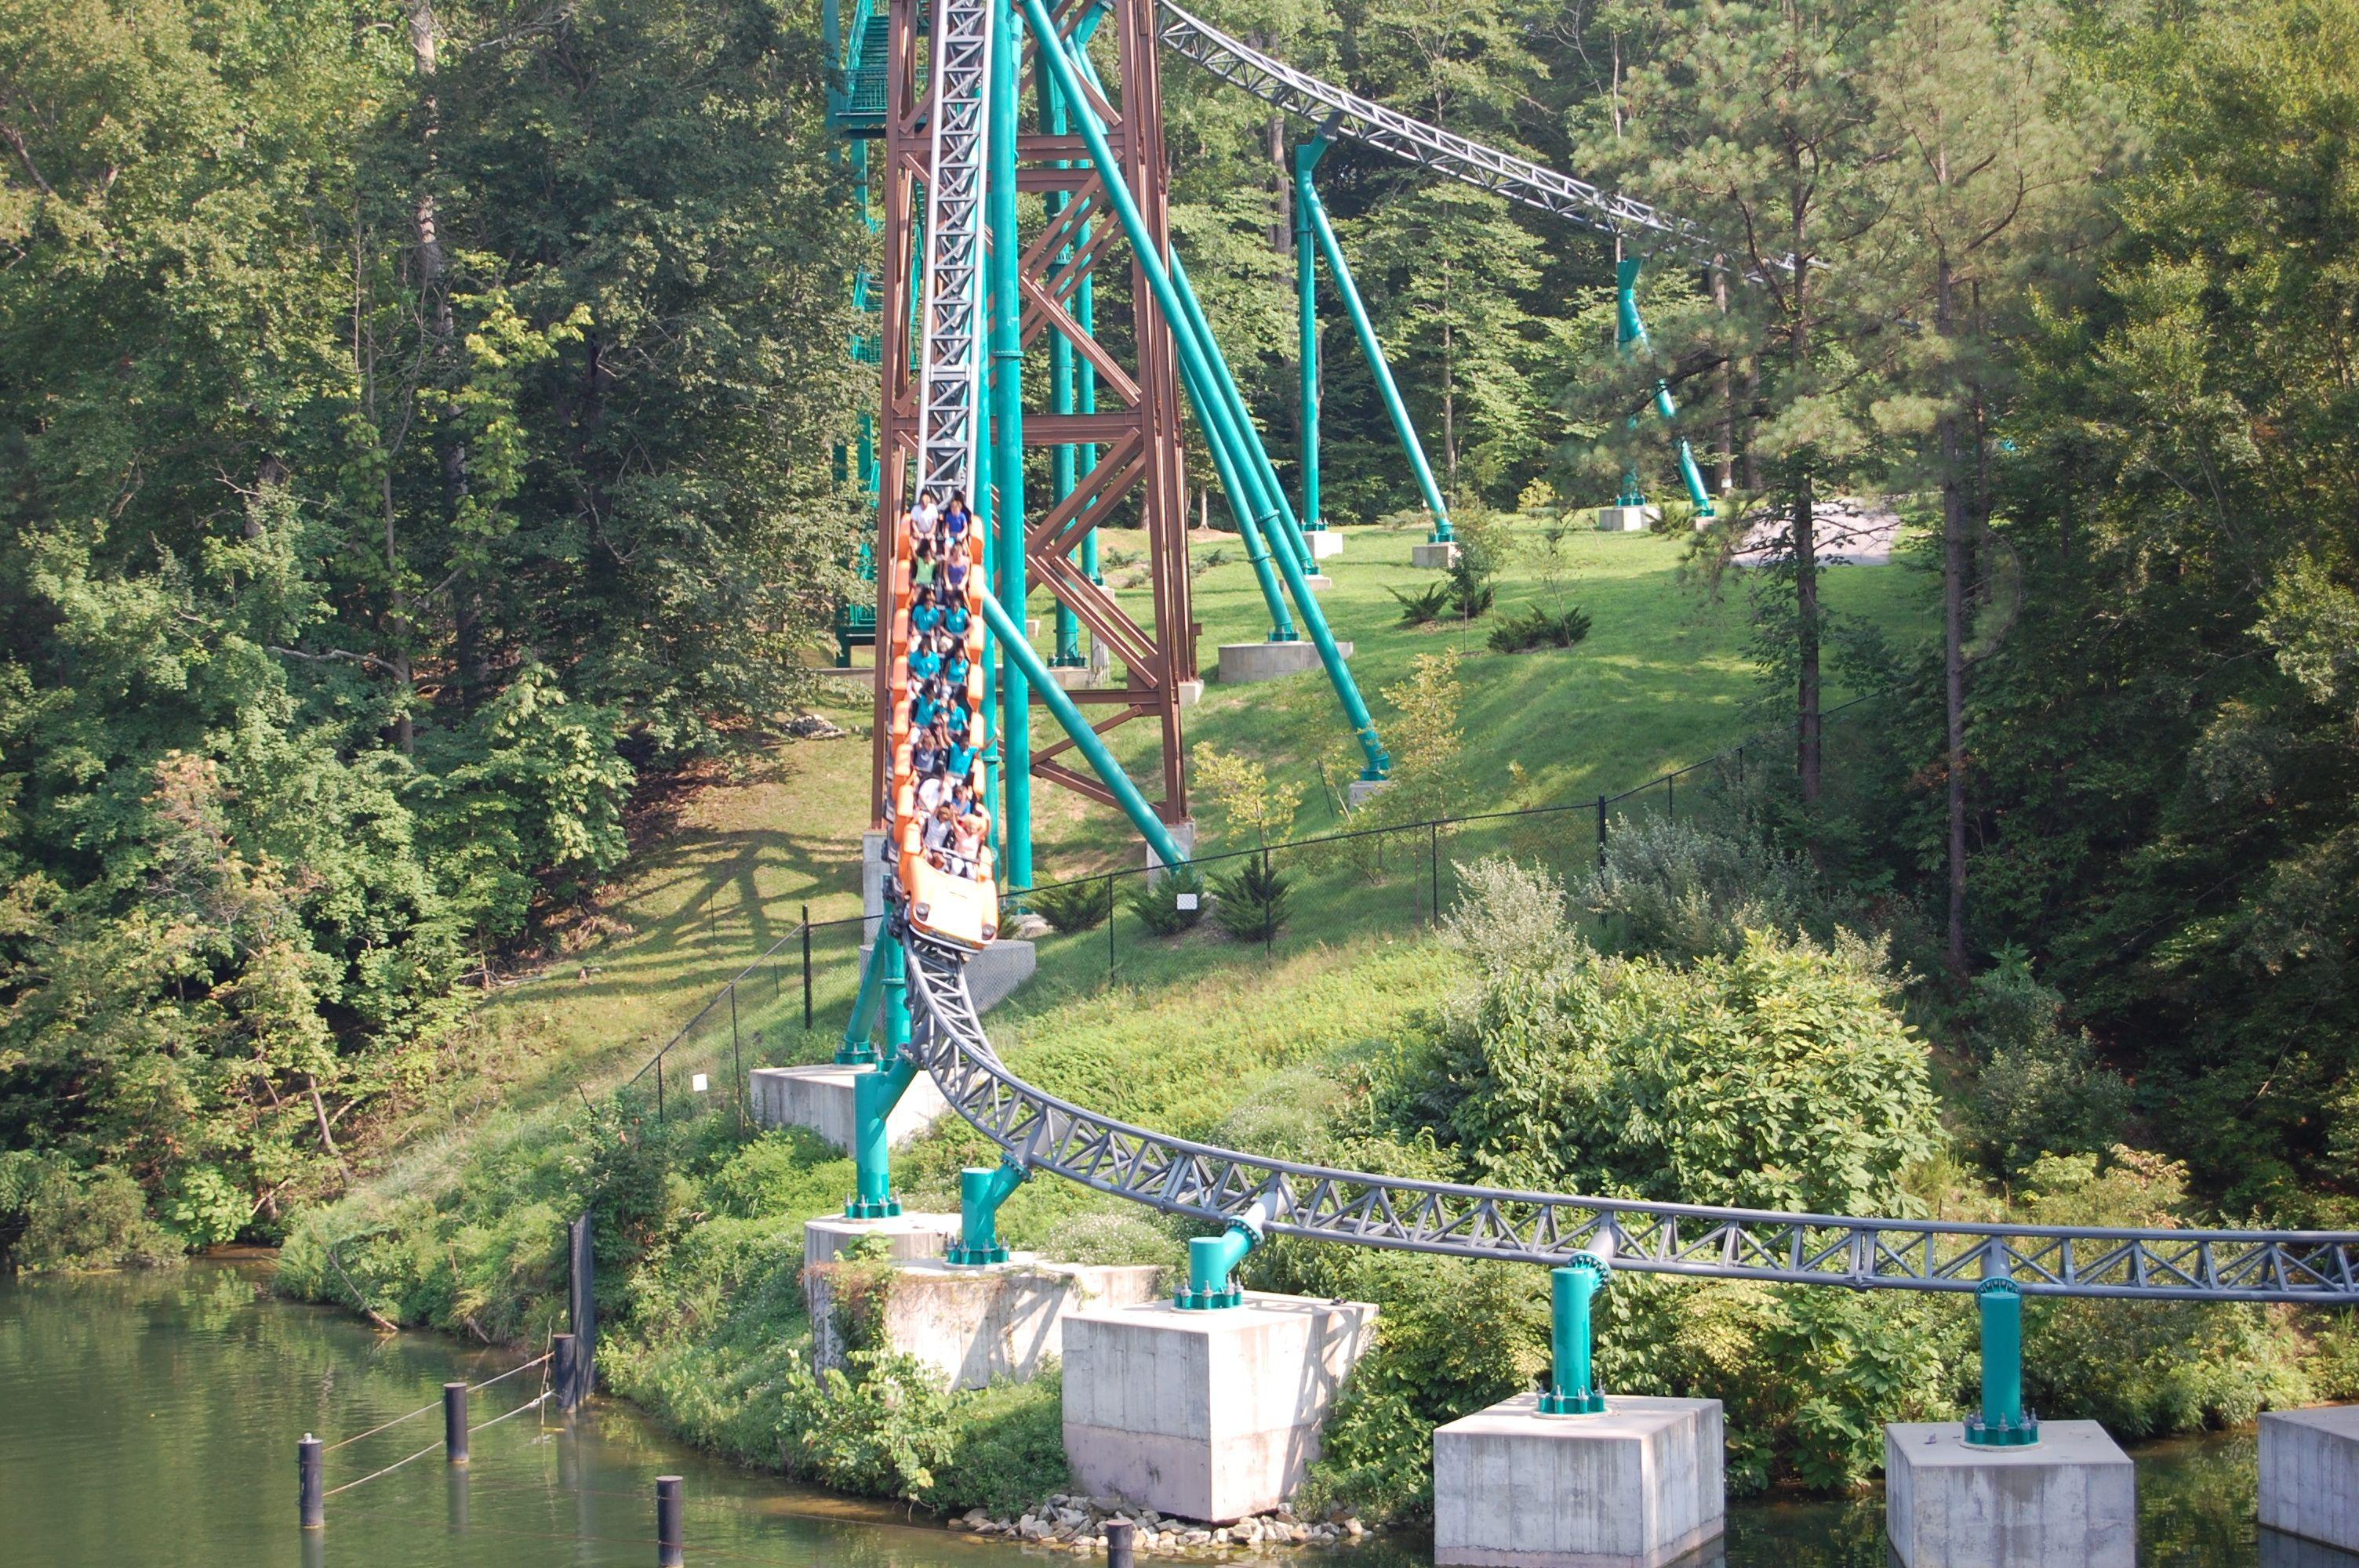 12f1773df6024e351cc5407138a36abd - Busch Gardens Tickets Williamsburg Va Discount